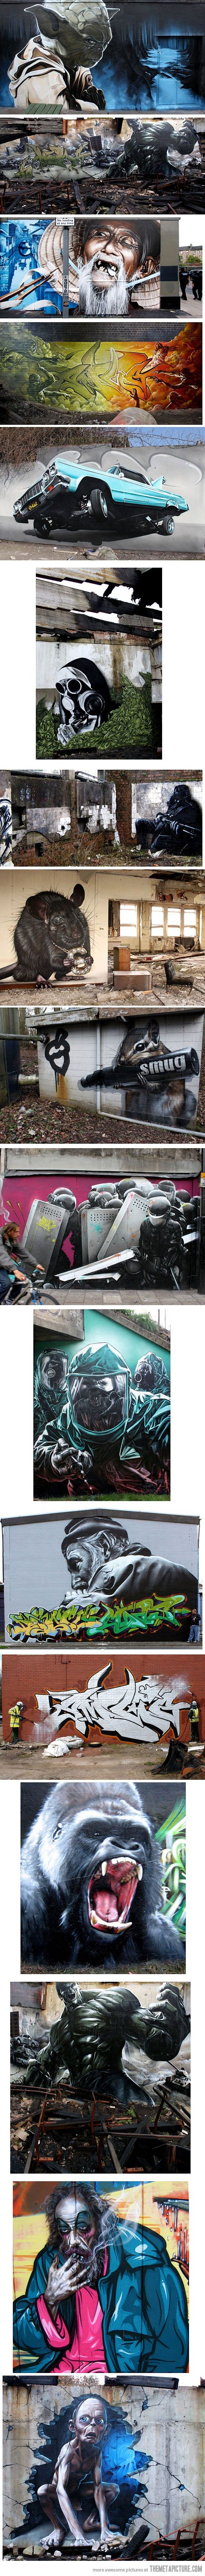 Amazing graffiti artwork by 'SmugOne' #streetart #graffiti #art https://www.etsy.com/shop/urbanNYCdesigns?ref=hdr_shop_menu